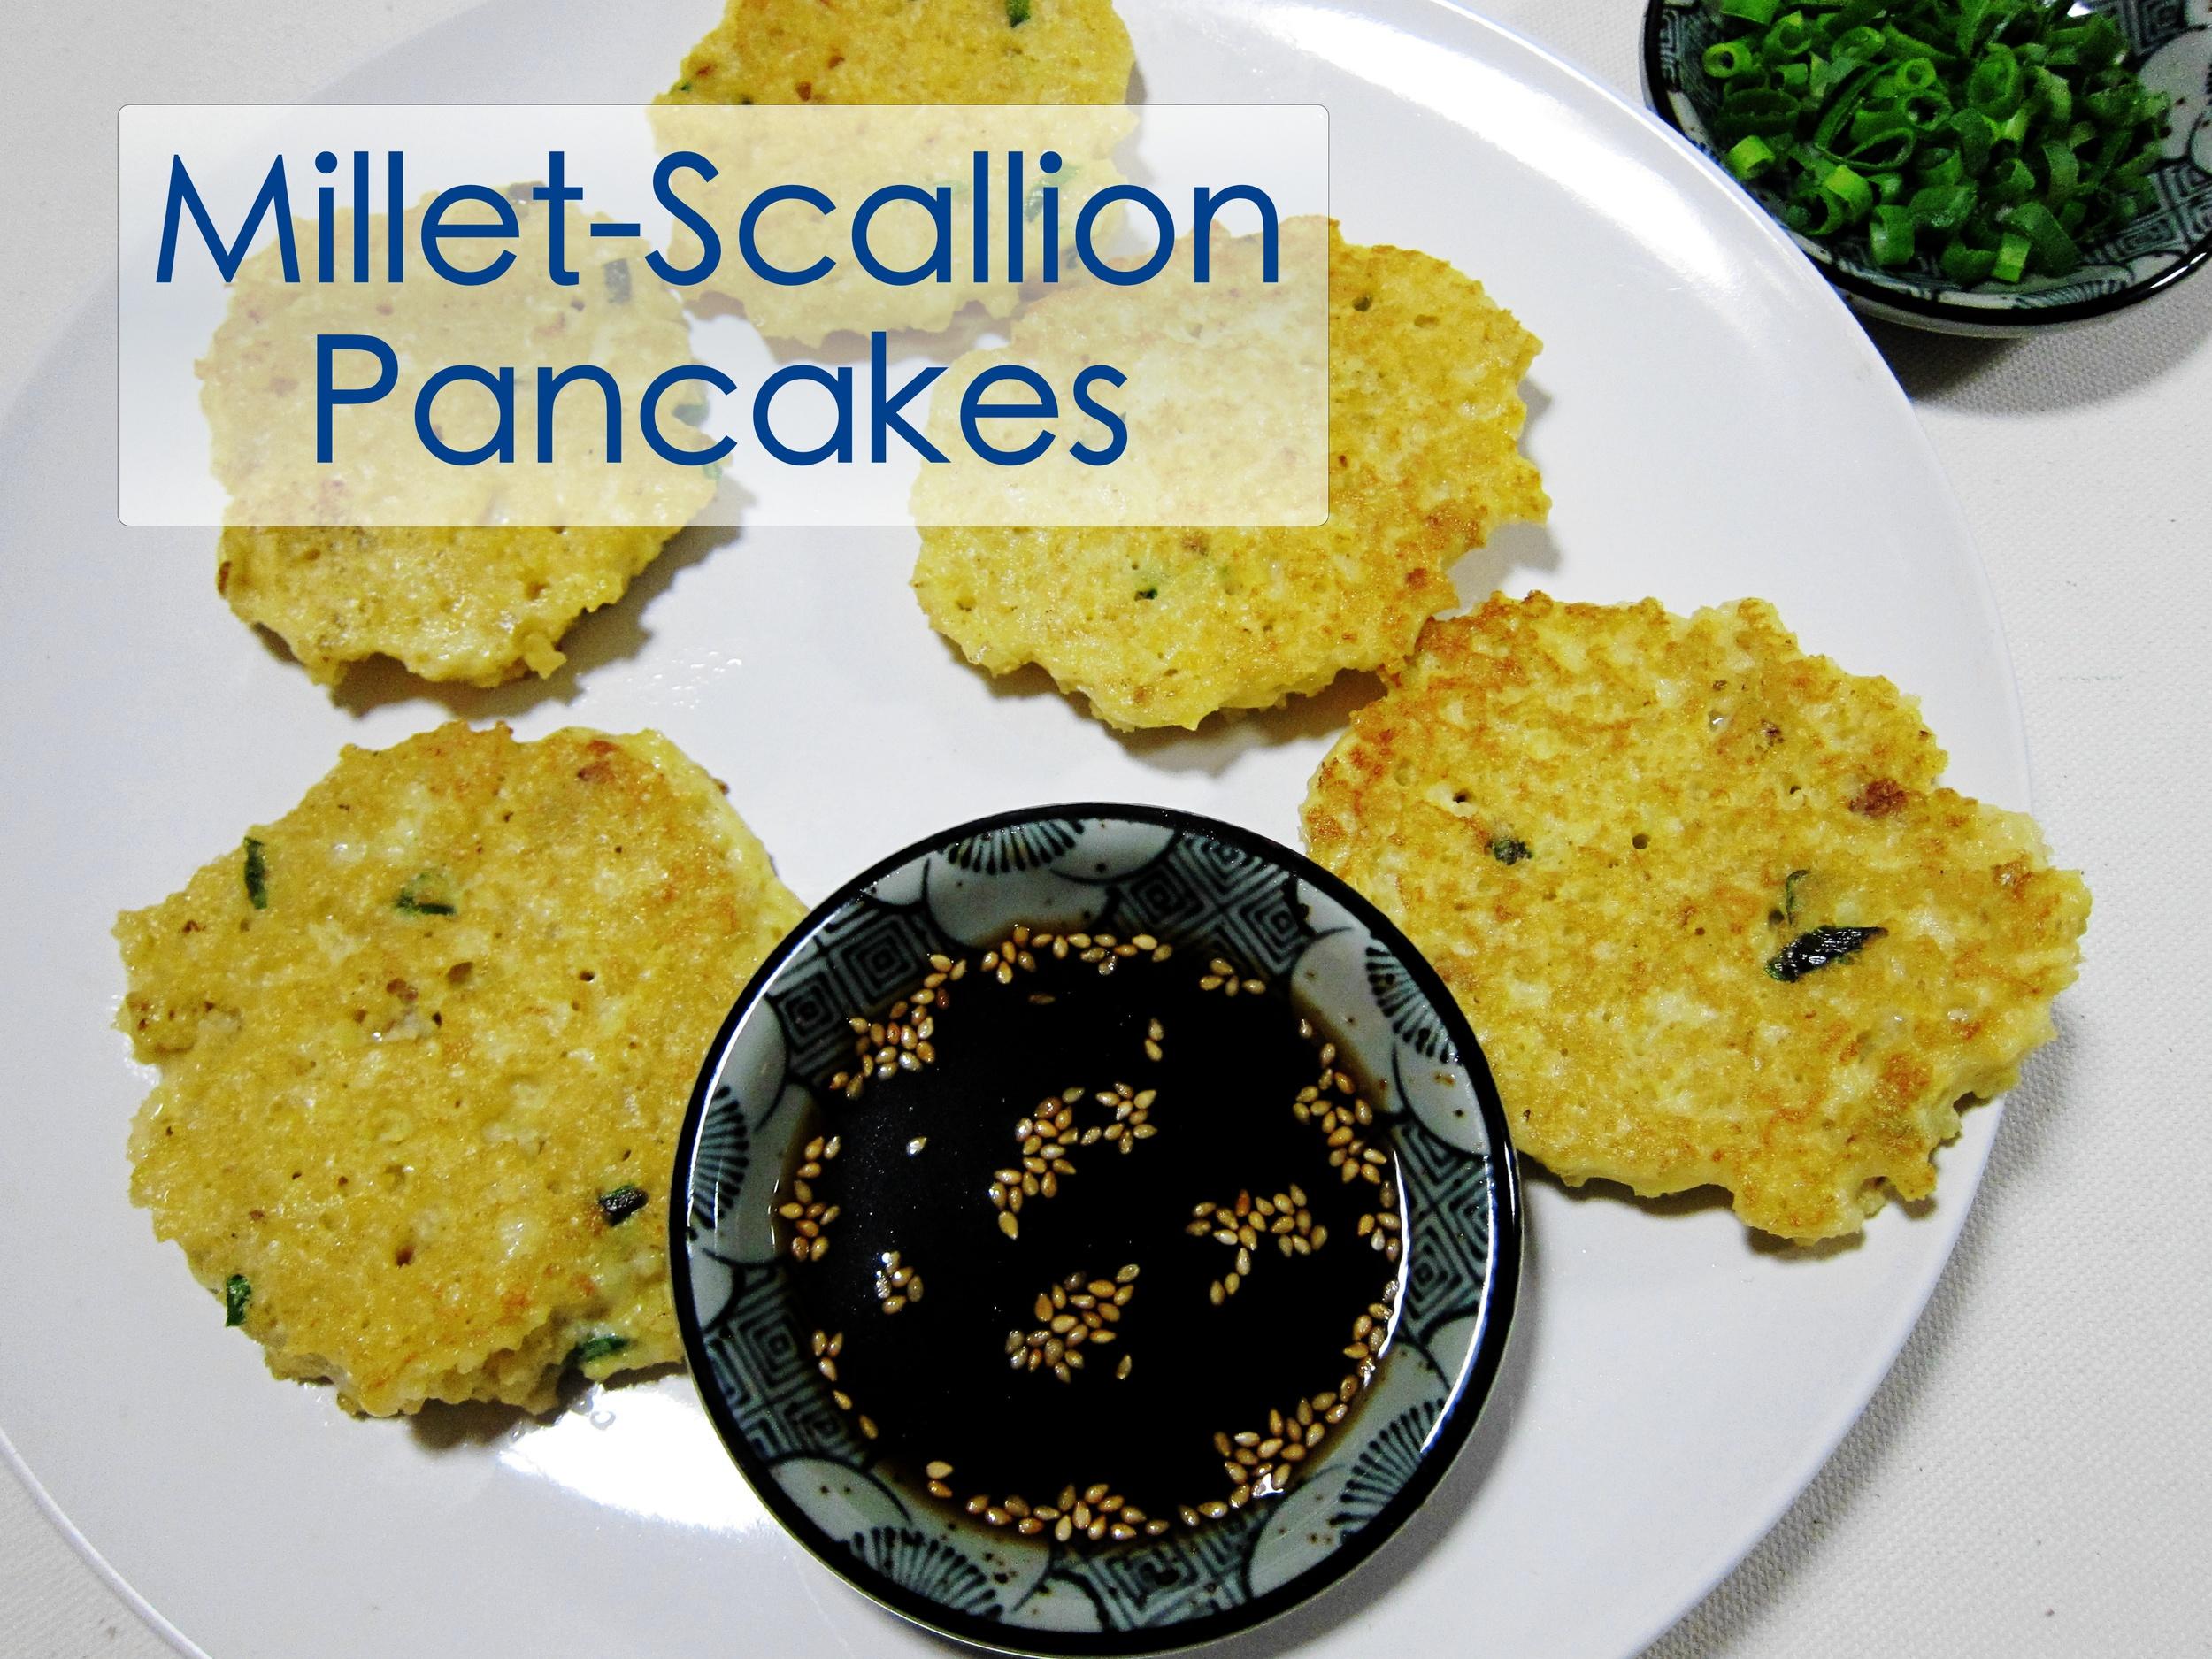 Millet Scallion Pancakes 1.jpg